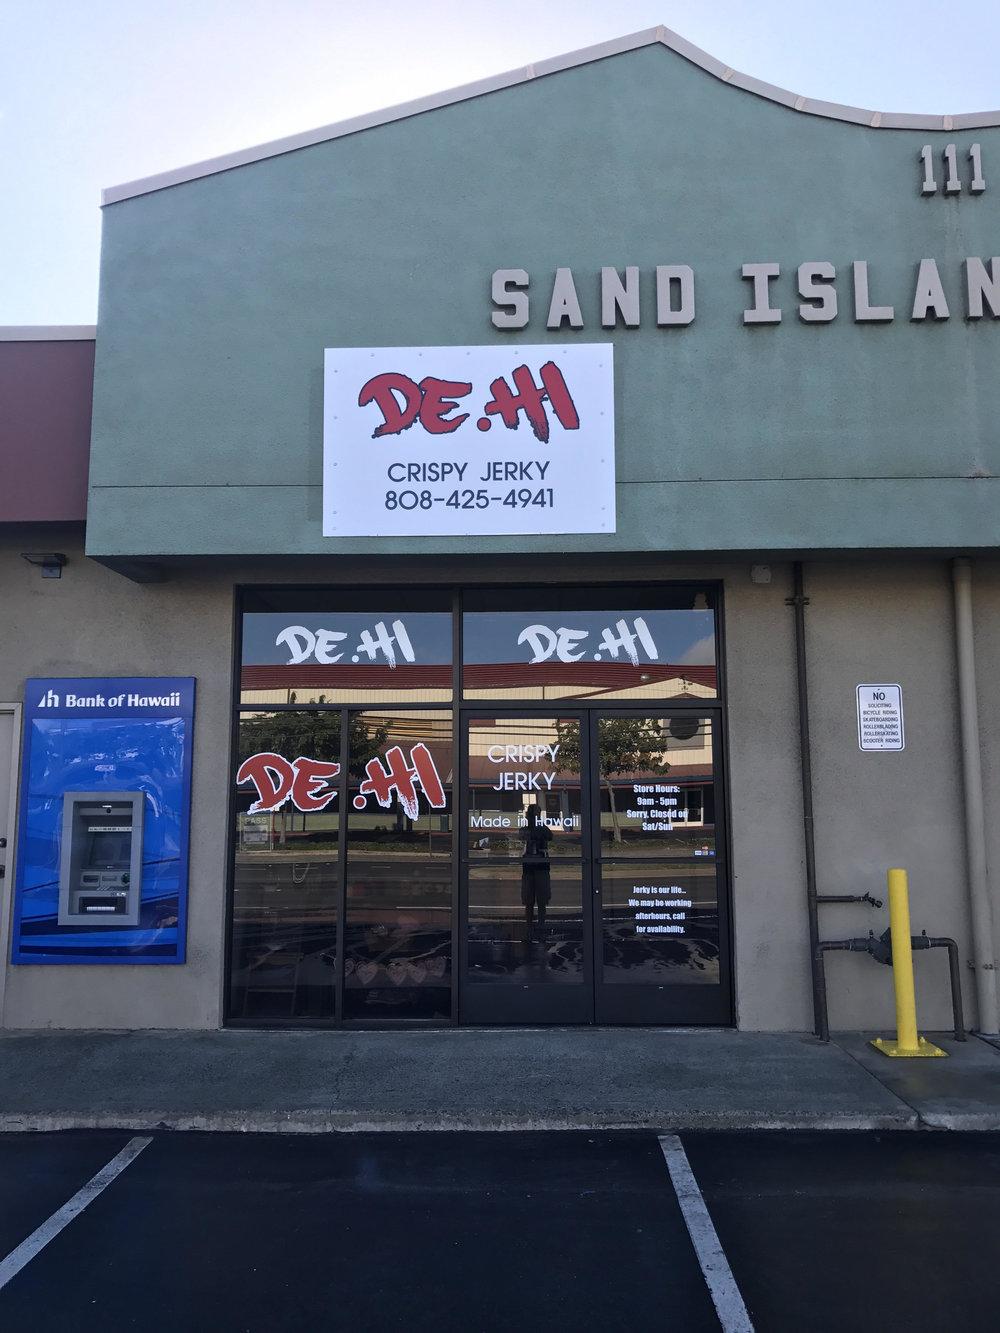 Sand Island Front.jpg